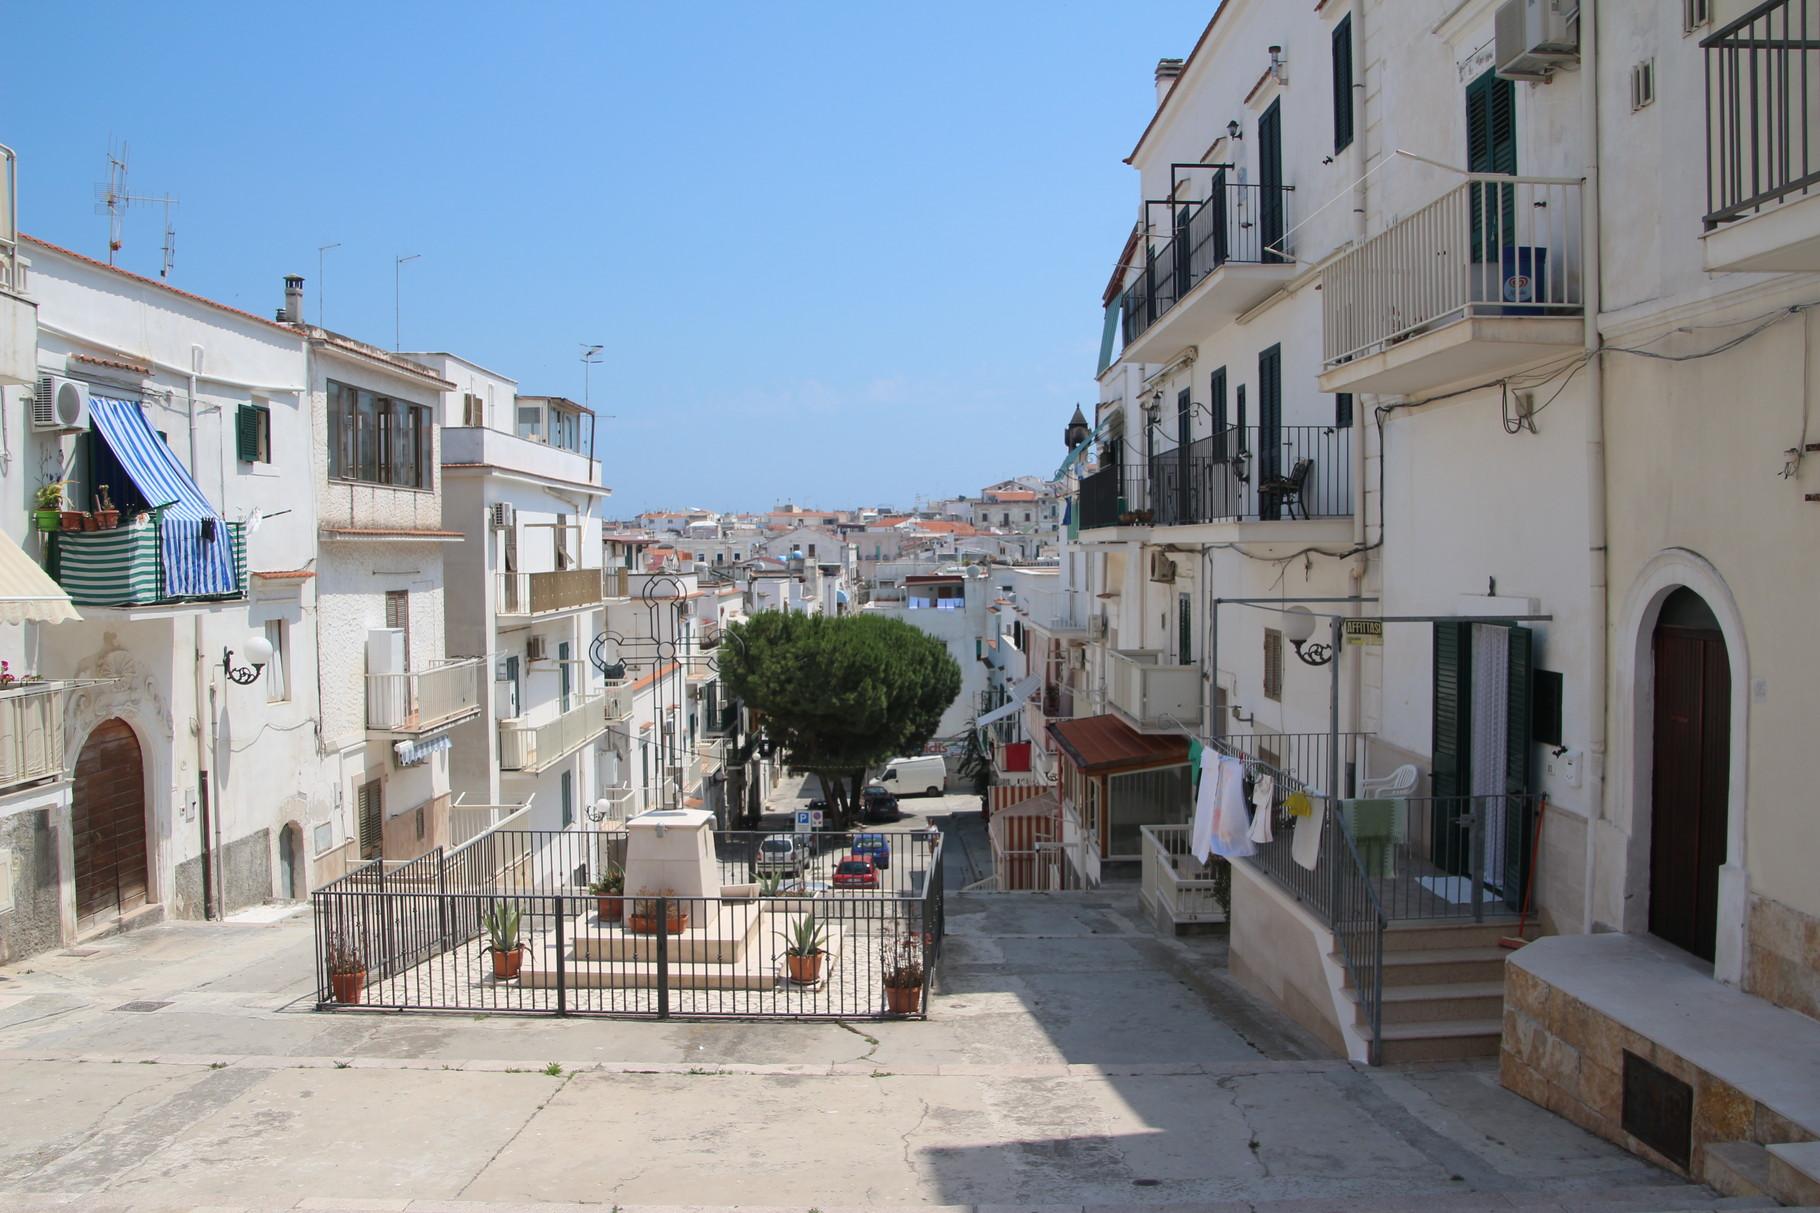 Vieste - Apulien